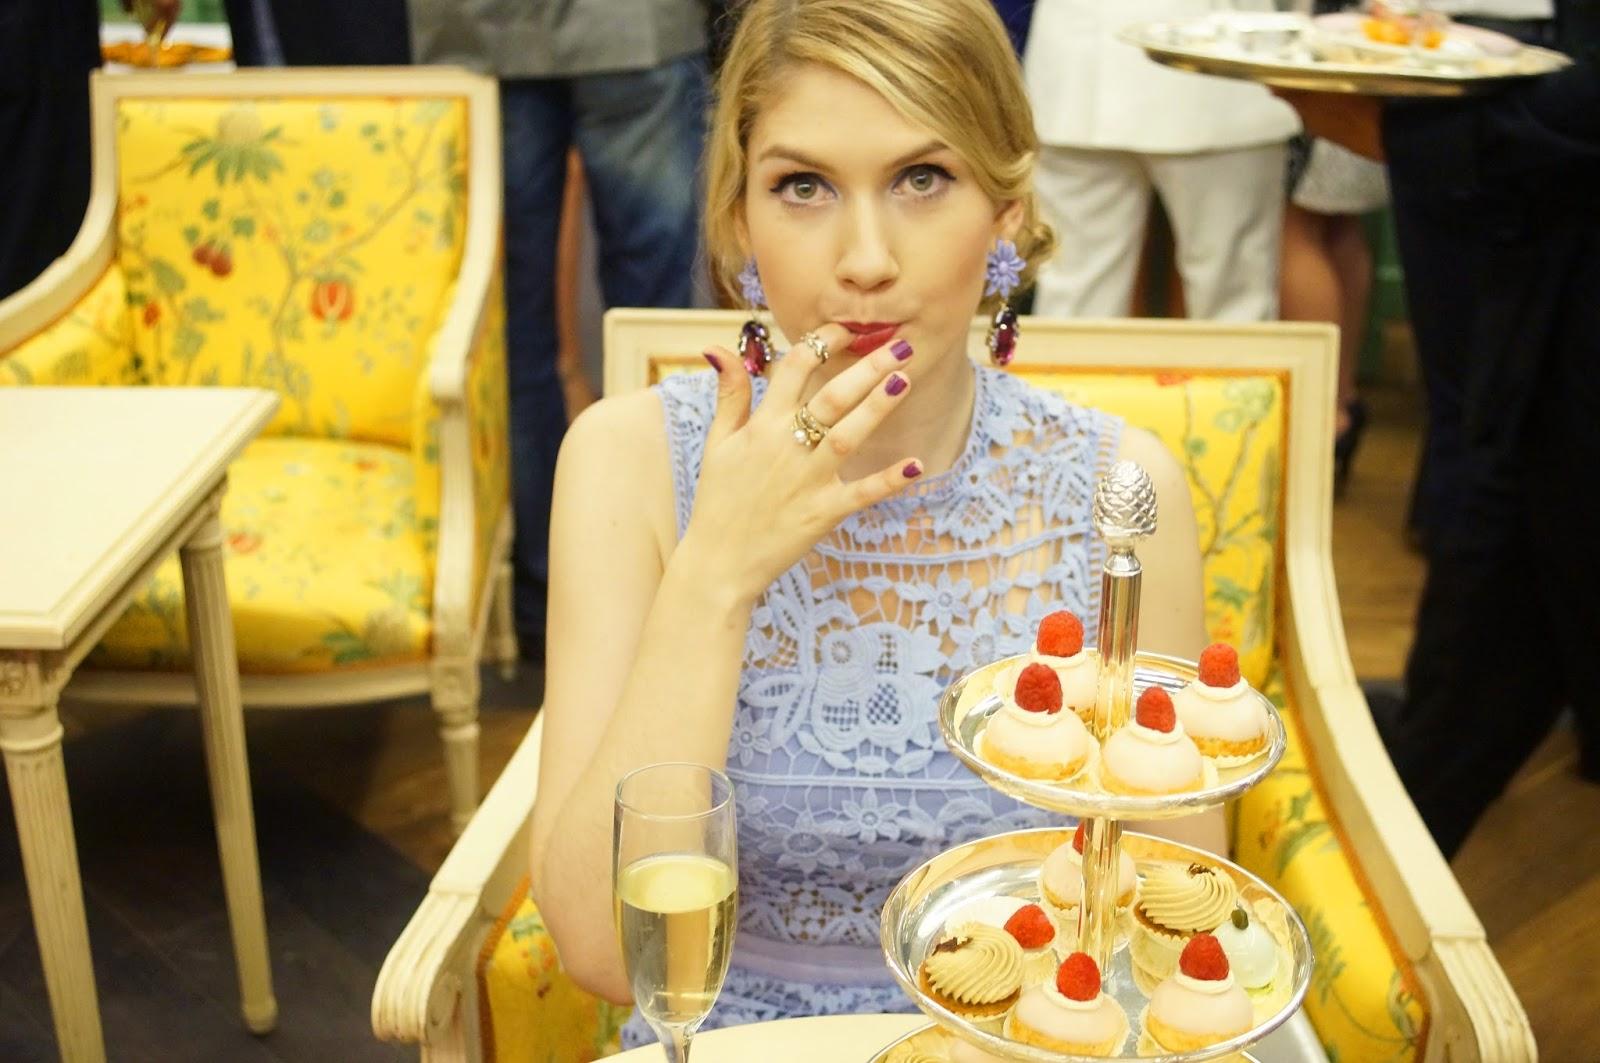 Life is short, eat all the dessert!